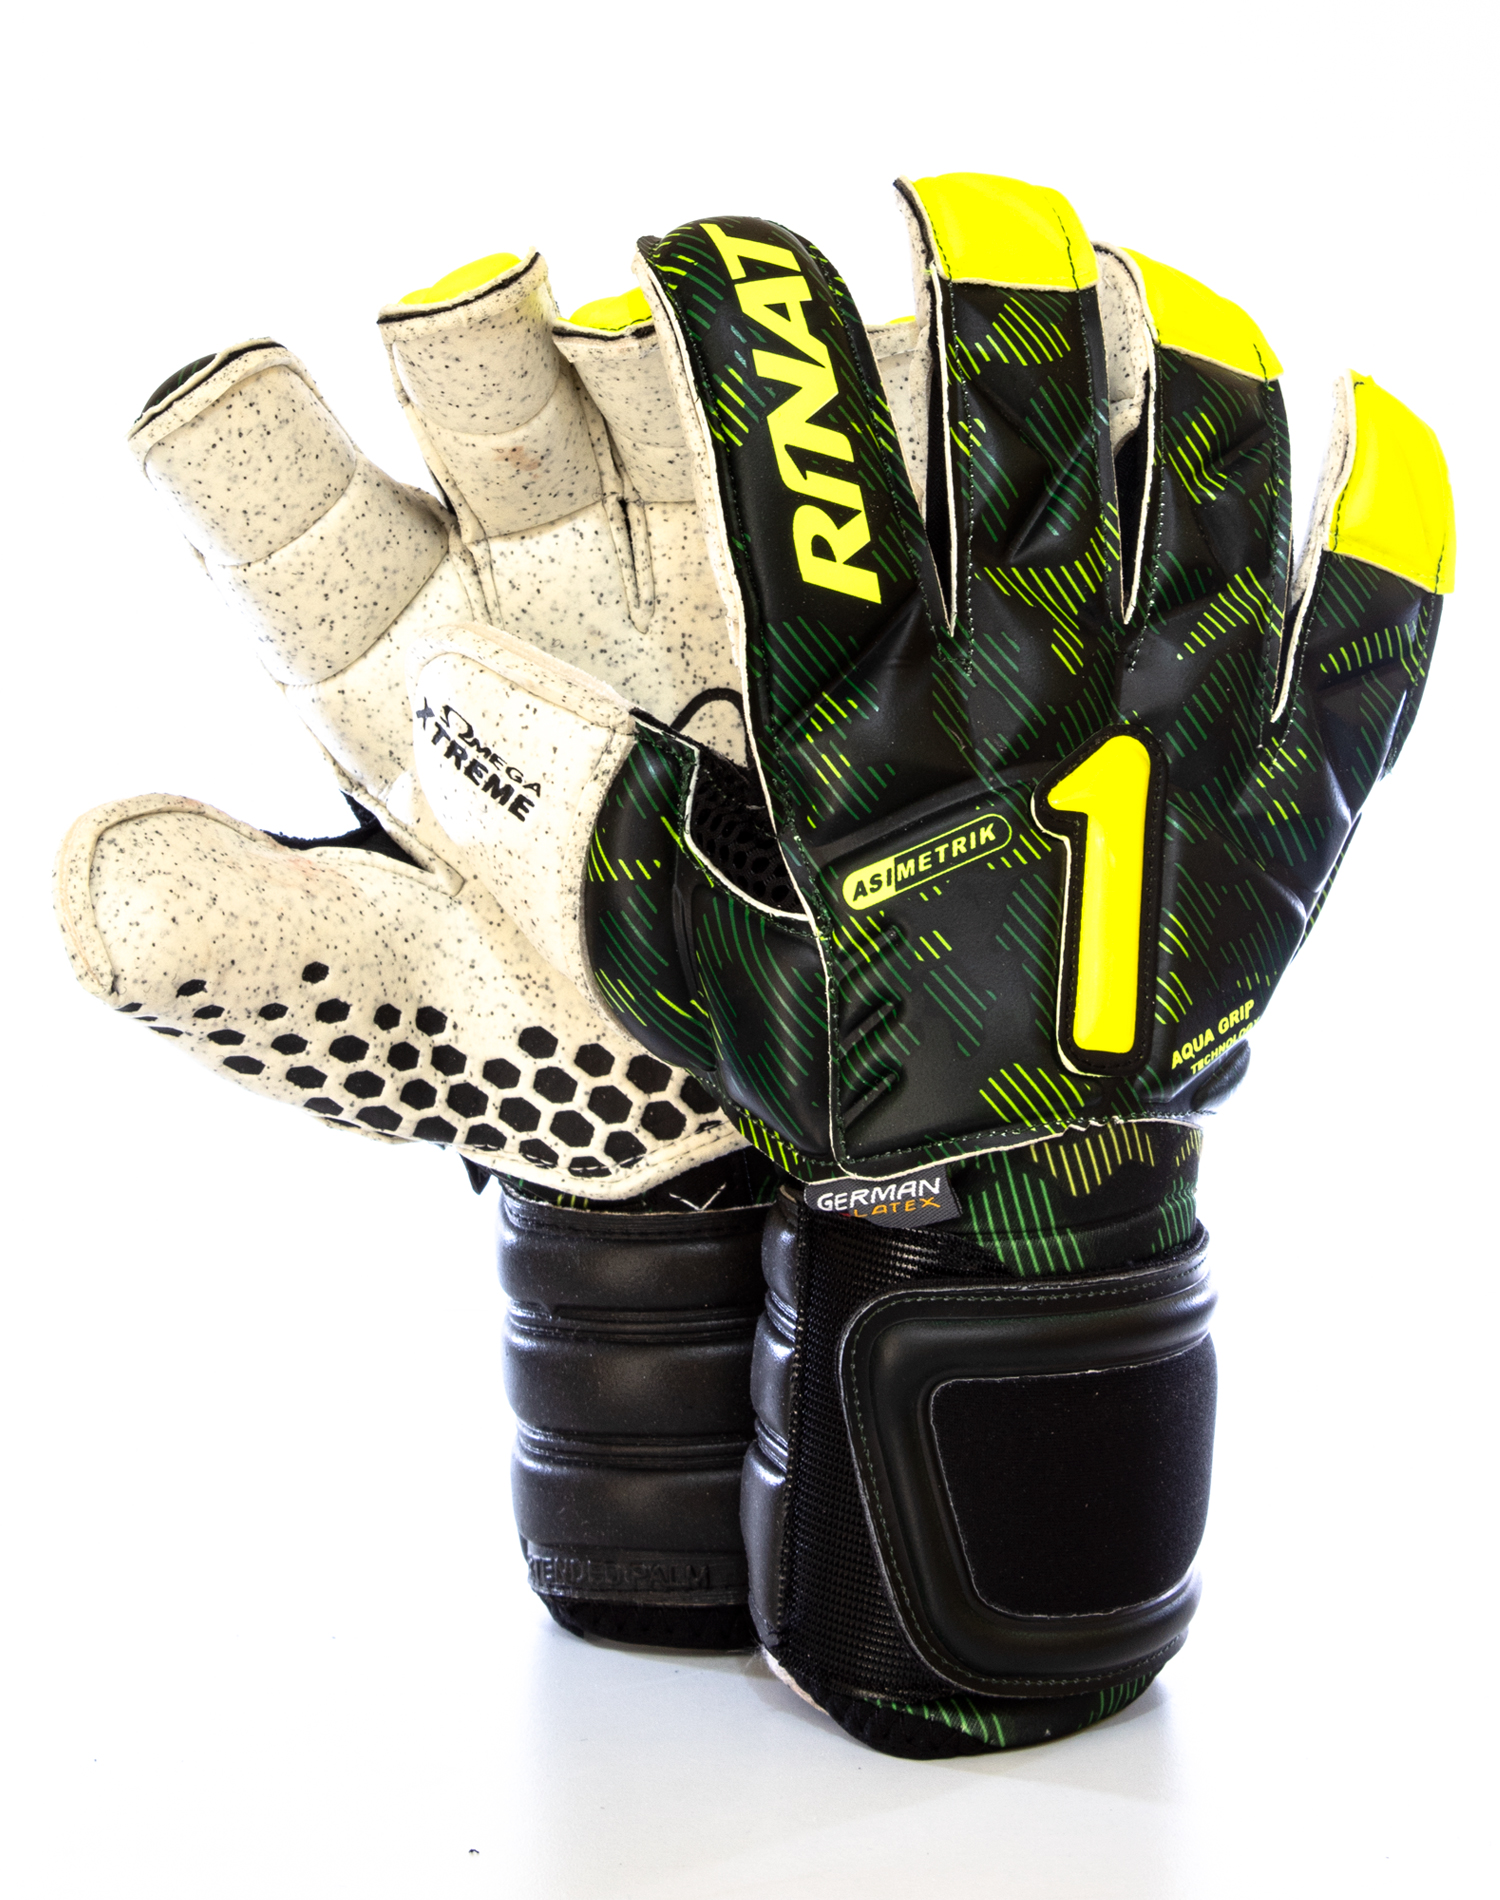 precio asombroso Códigos promocionales selección premium Guantes Rinat Asimetrik Hunter Pro Verde - Amarillo - Golero Sport